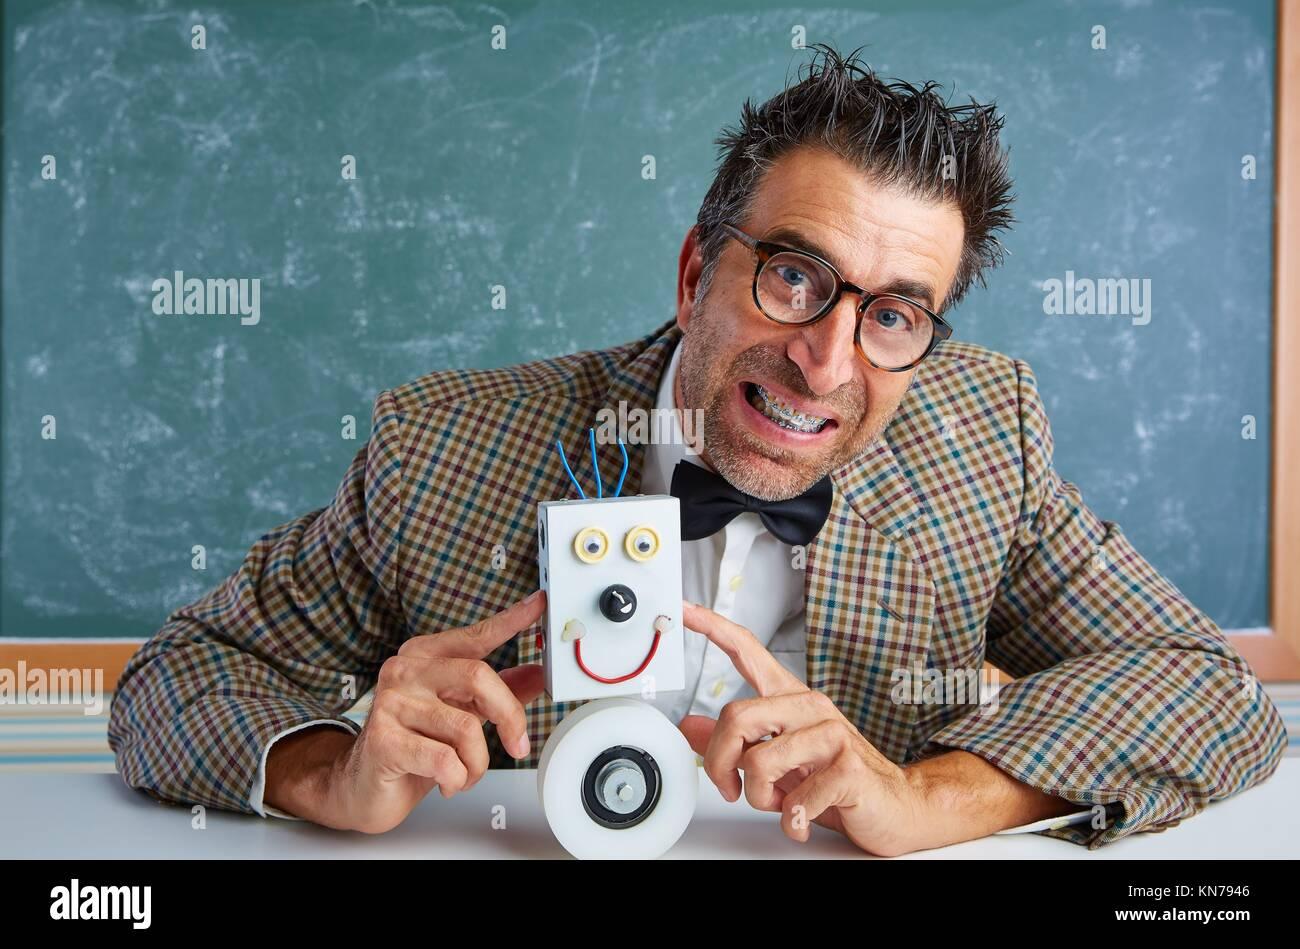 Nerd electronics technician with self made robot silly retro teacher. - Stock Image